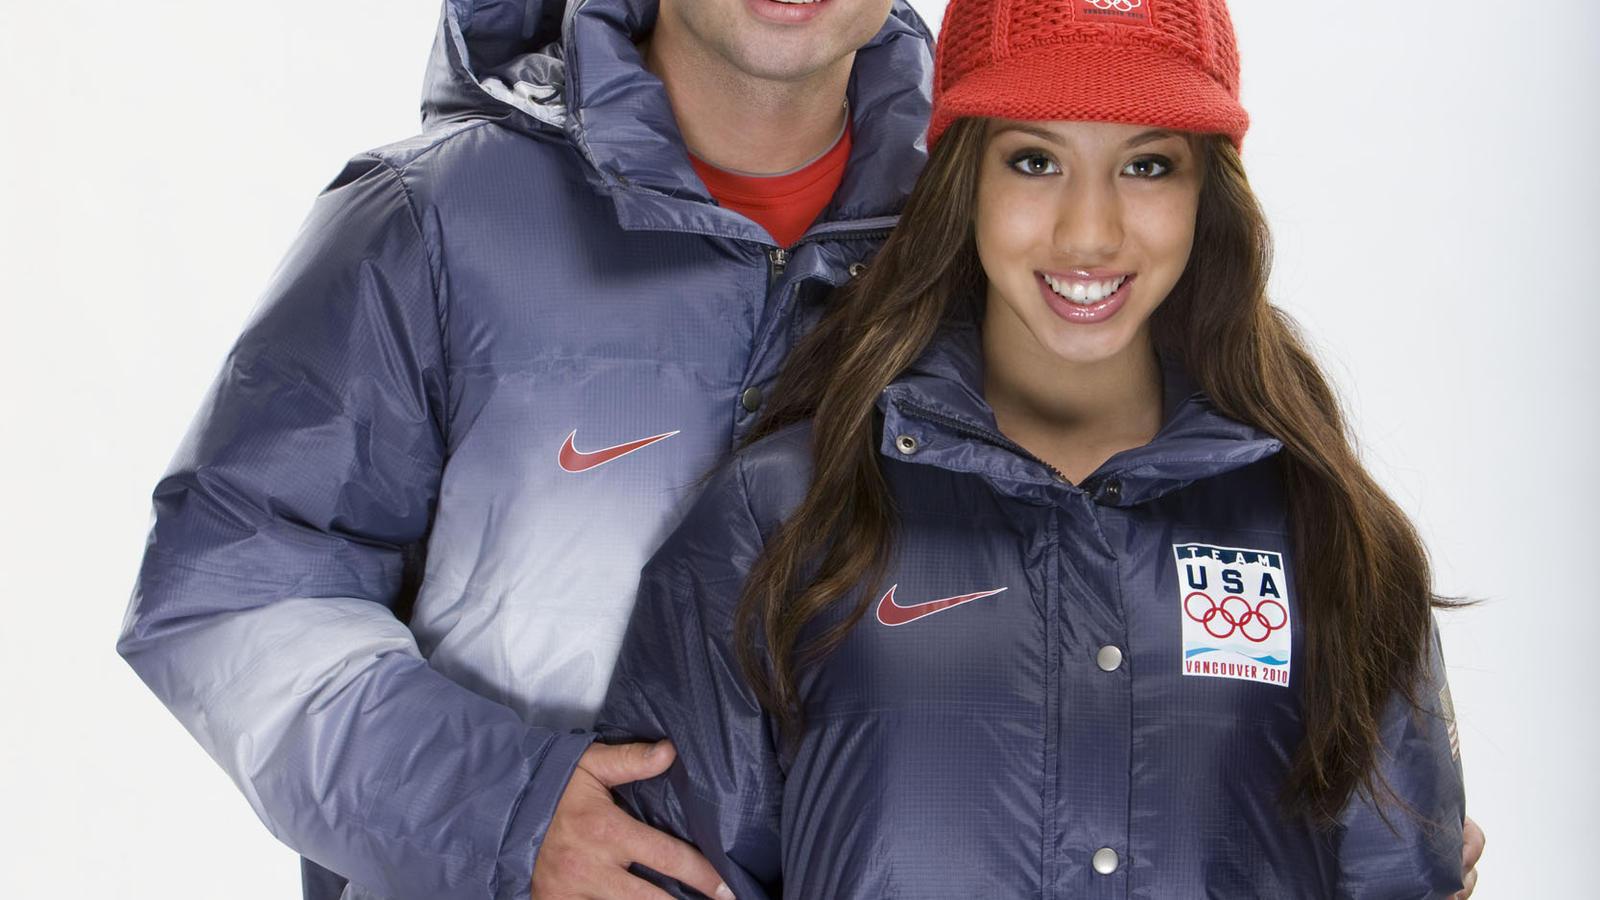 Team USA unveils medal stand looks - Nike News